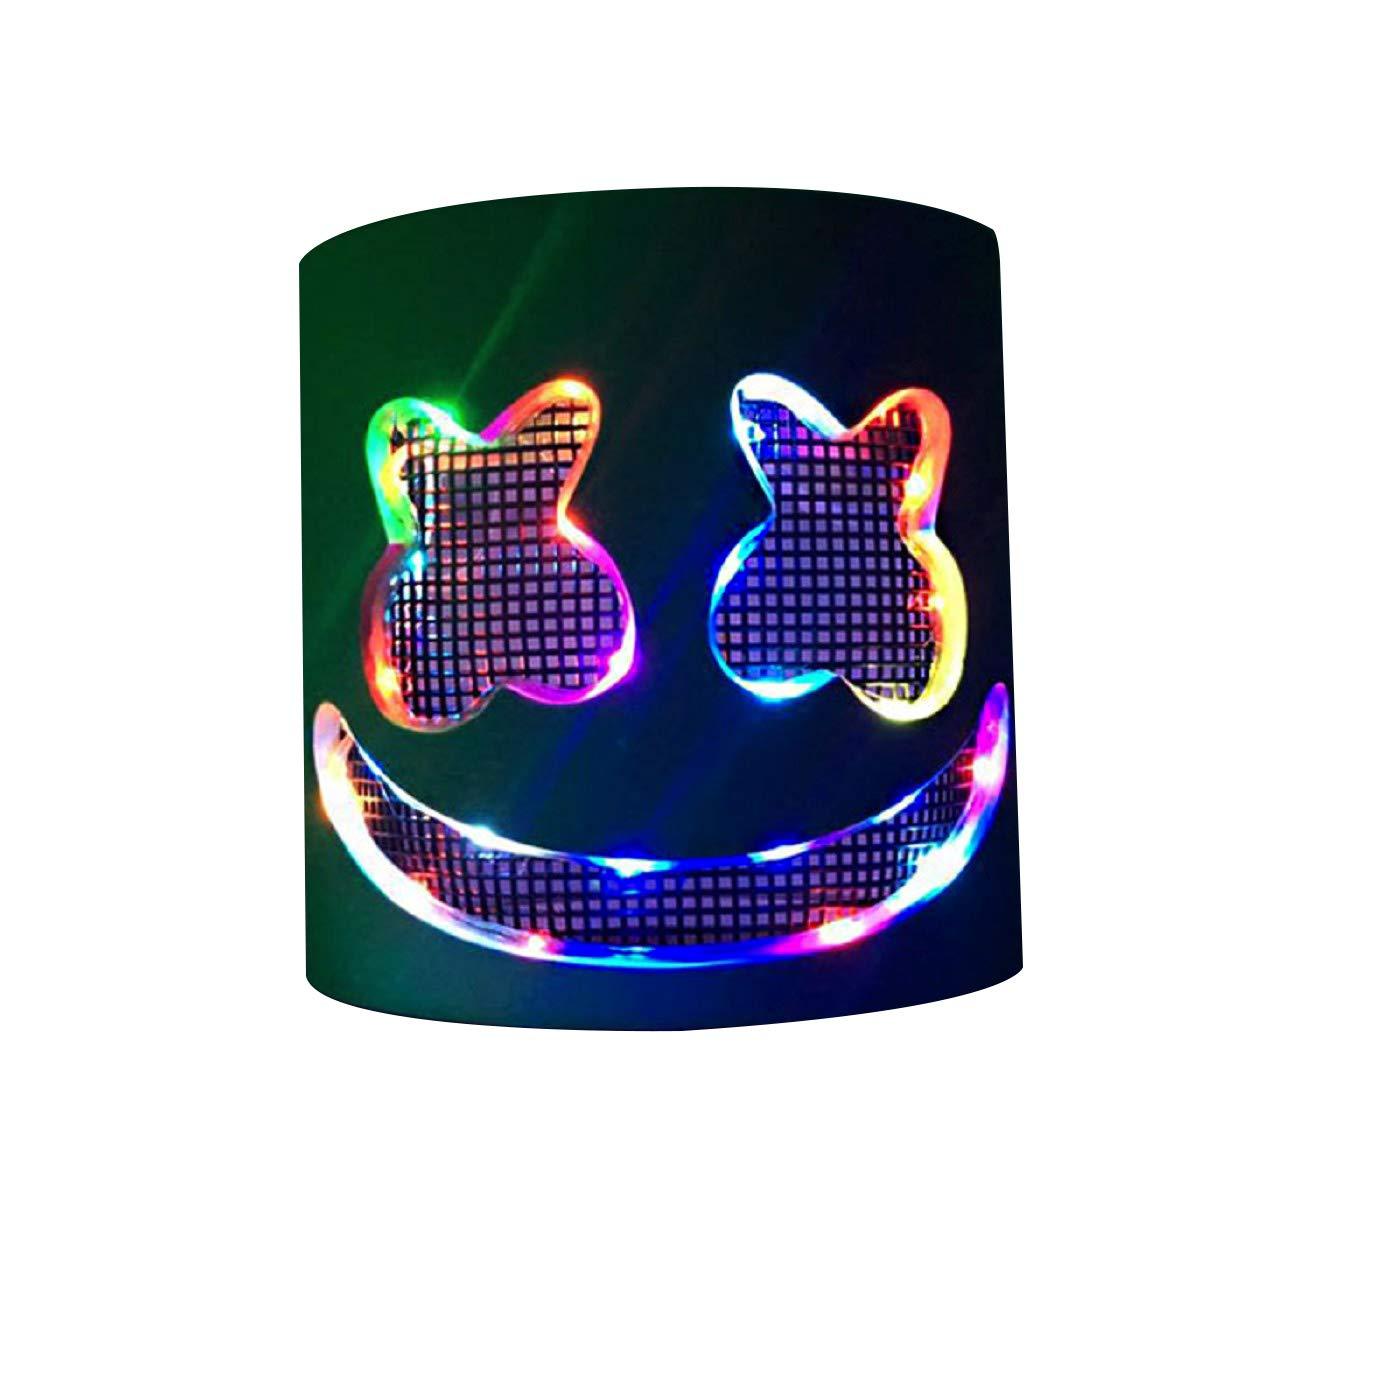 SDUQAN DJ Marshmello Mask,DJ Mask for Kids/Adults, LED DJ Mask Musical Party Masks Birthday Gifts,EVA Non Smell Costume Decor ((1) Led Colorful)